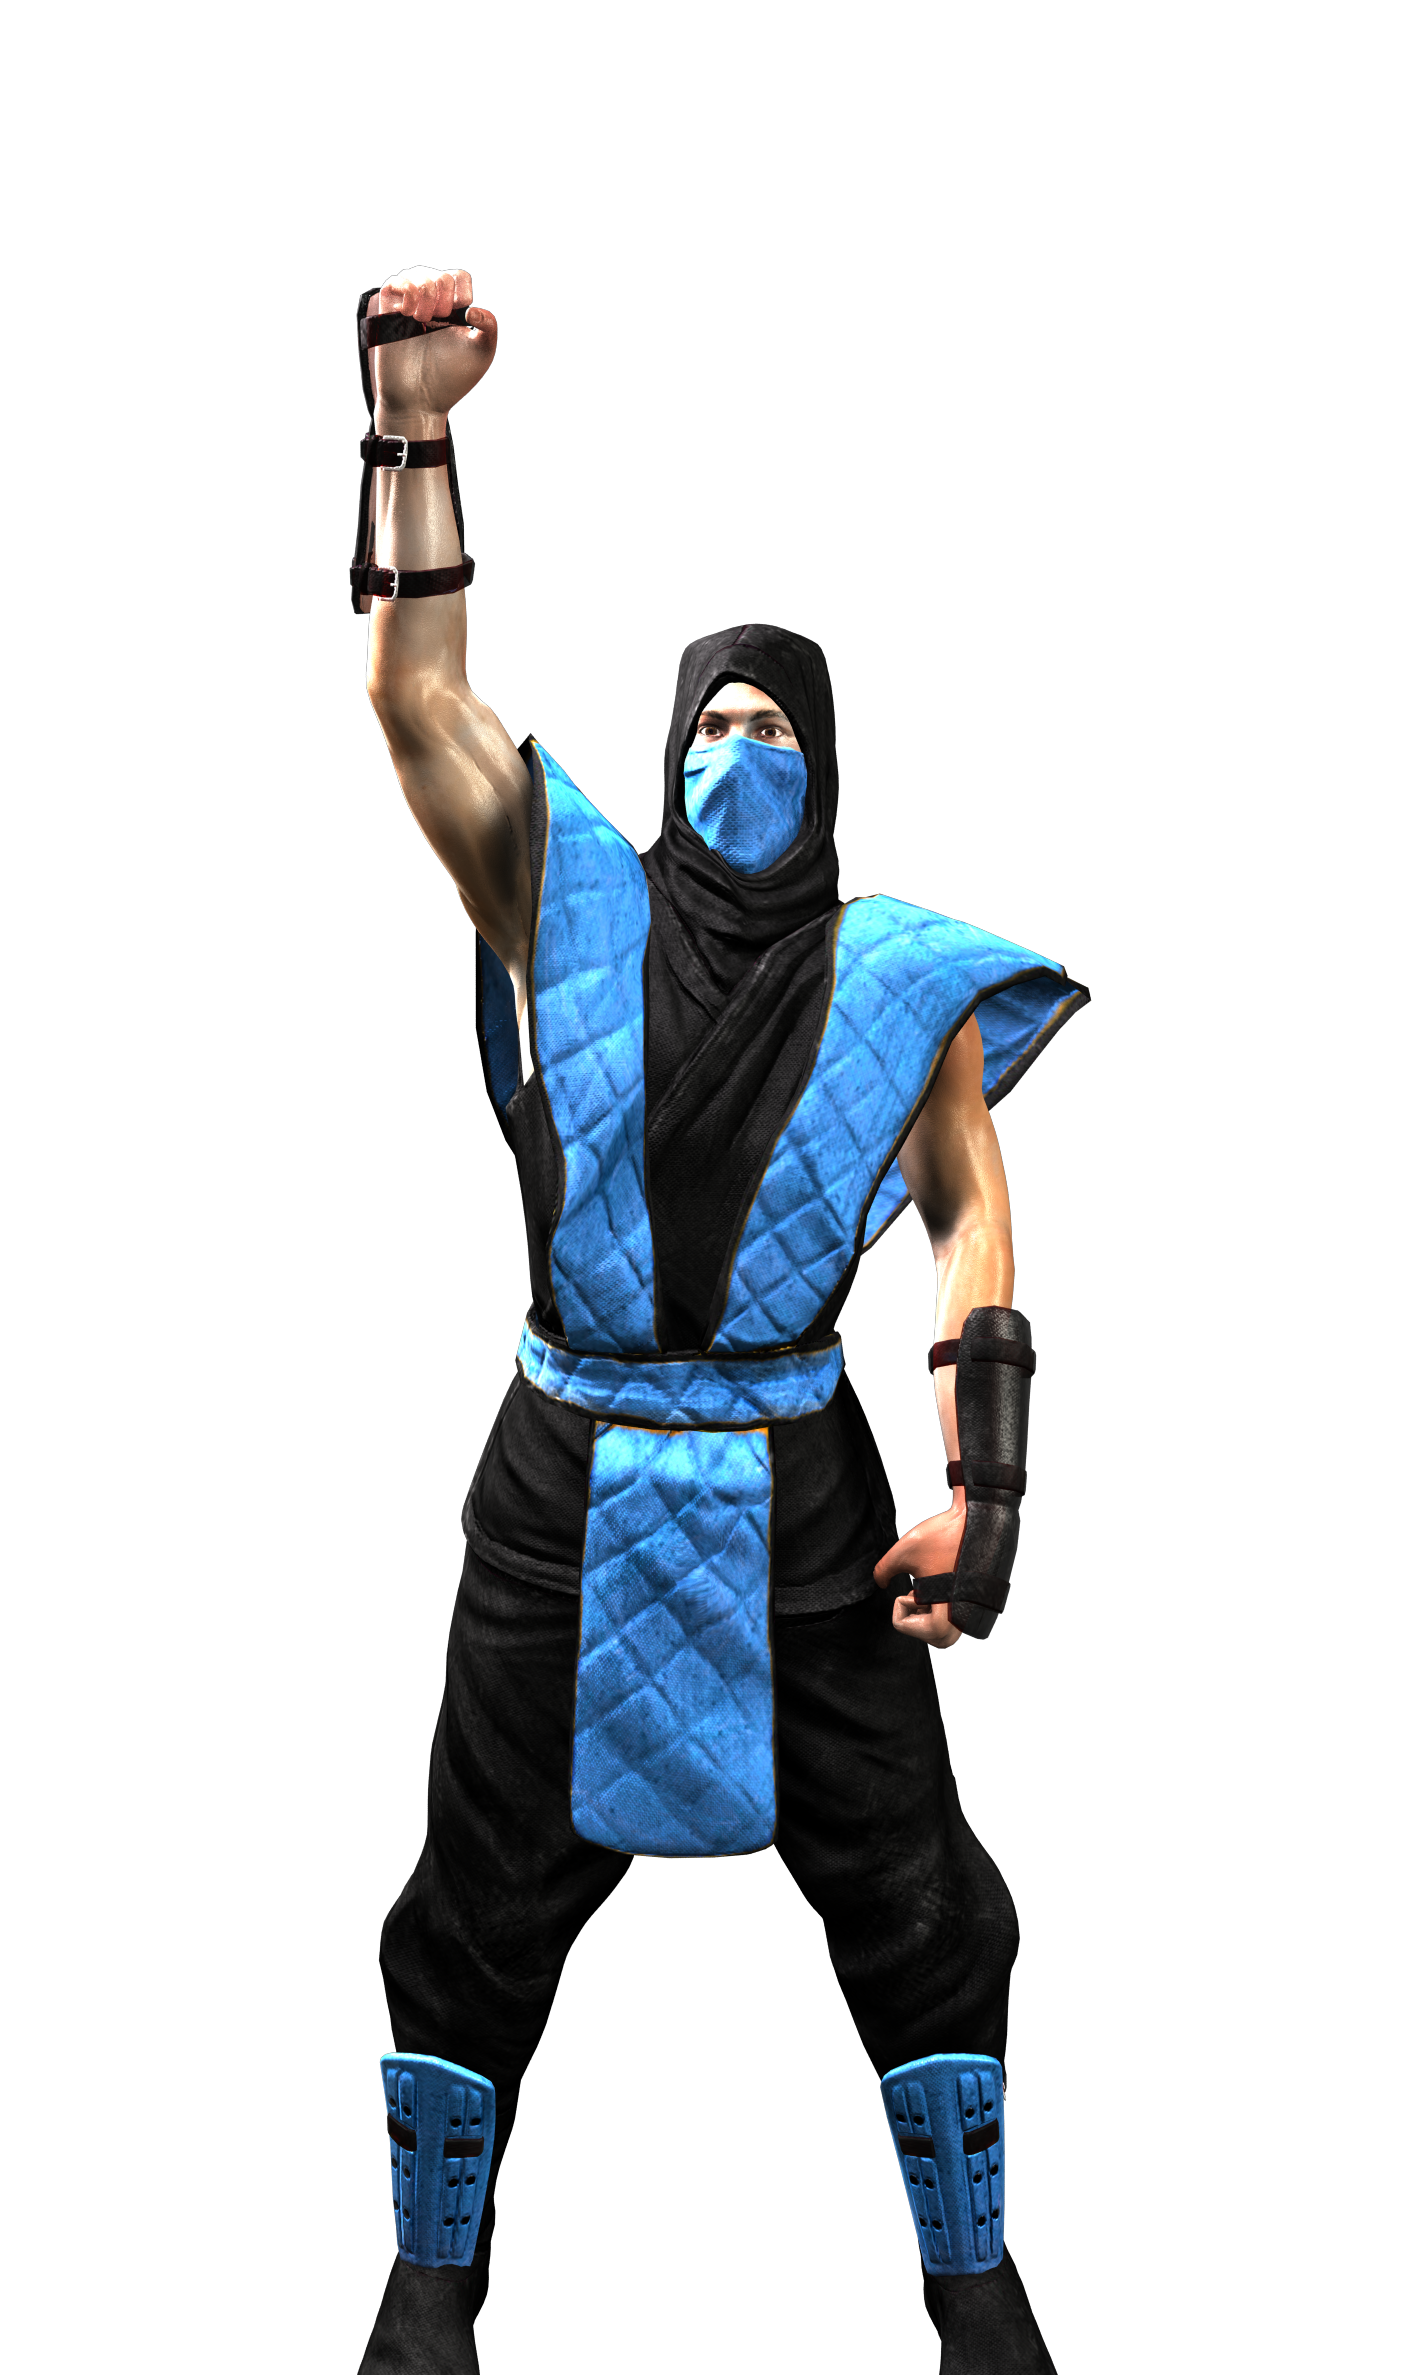 Mortal Kombat HD PNG - 117378